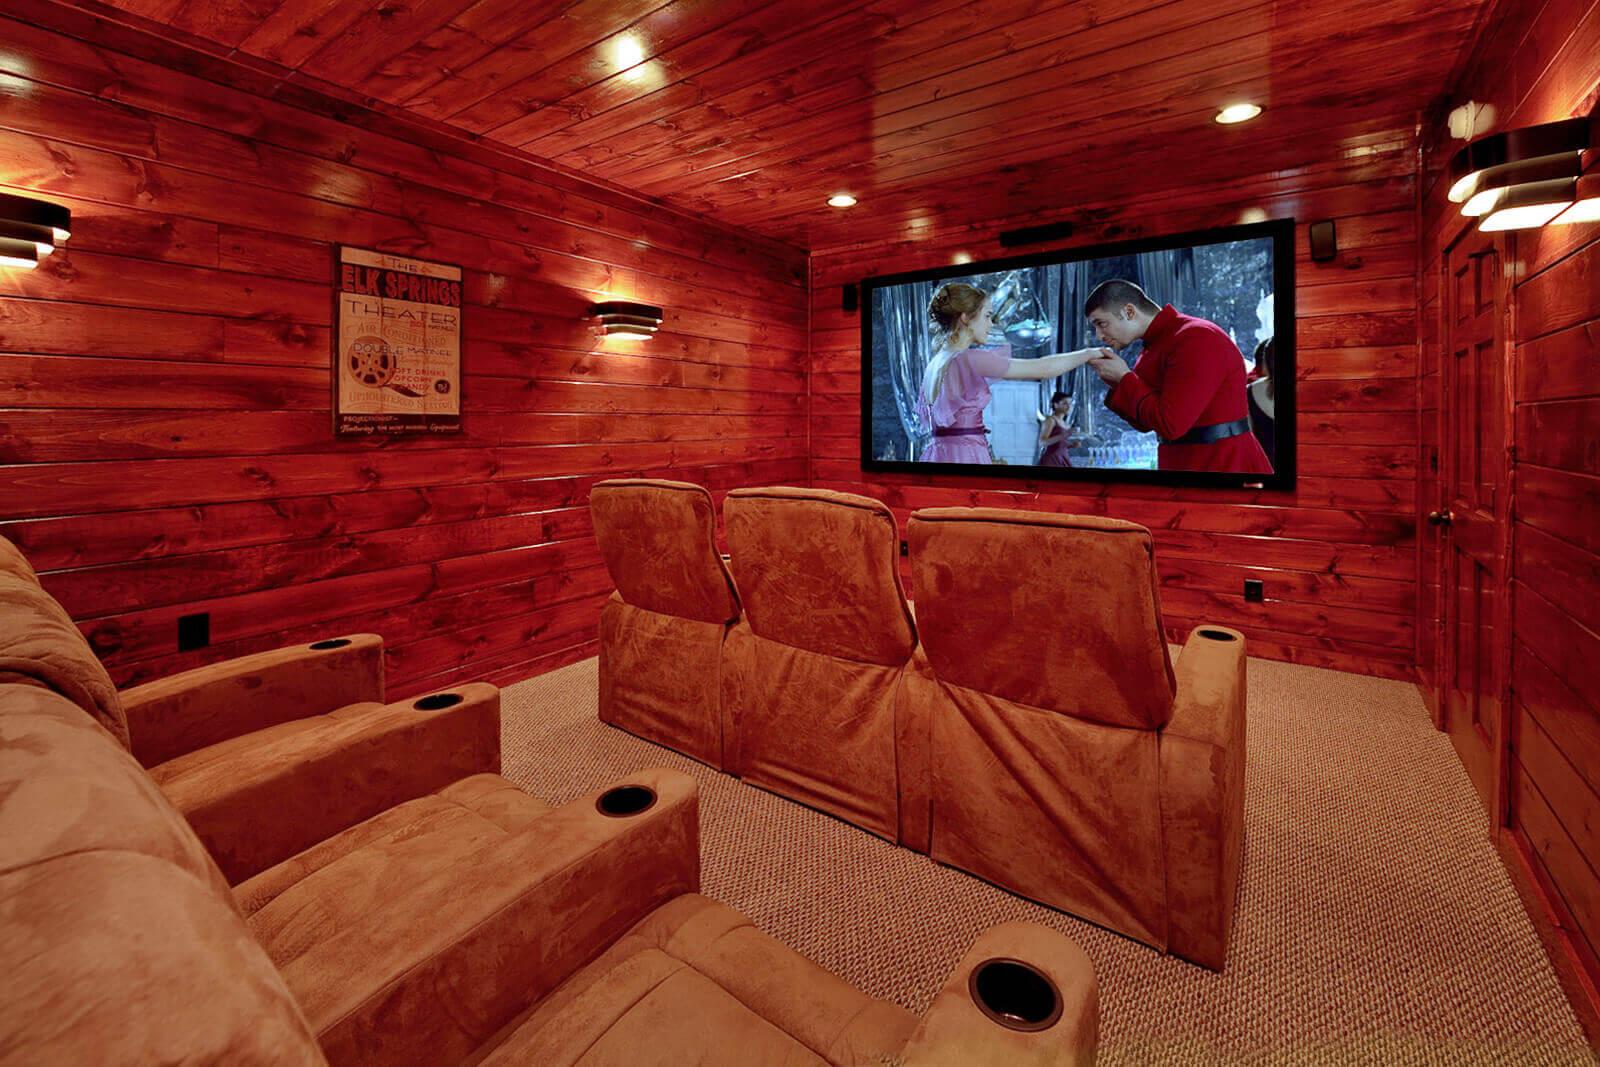 tn gatlinburgcabinsforrent rentals for cabins gatlinburg htm rent cabin bear best in new hugs